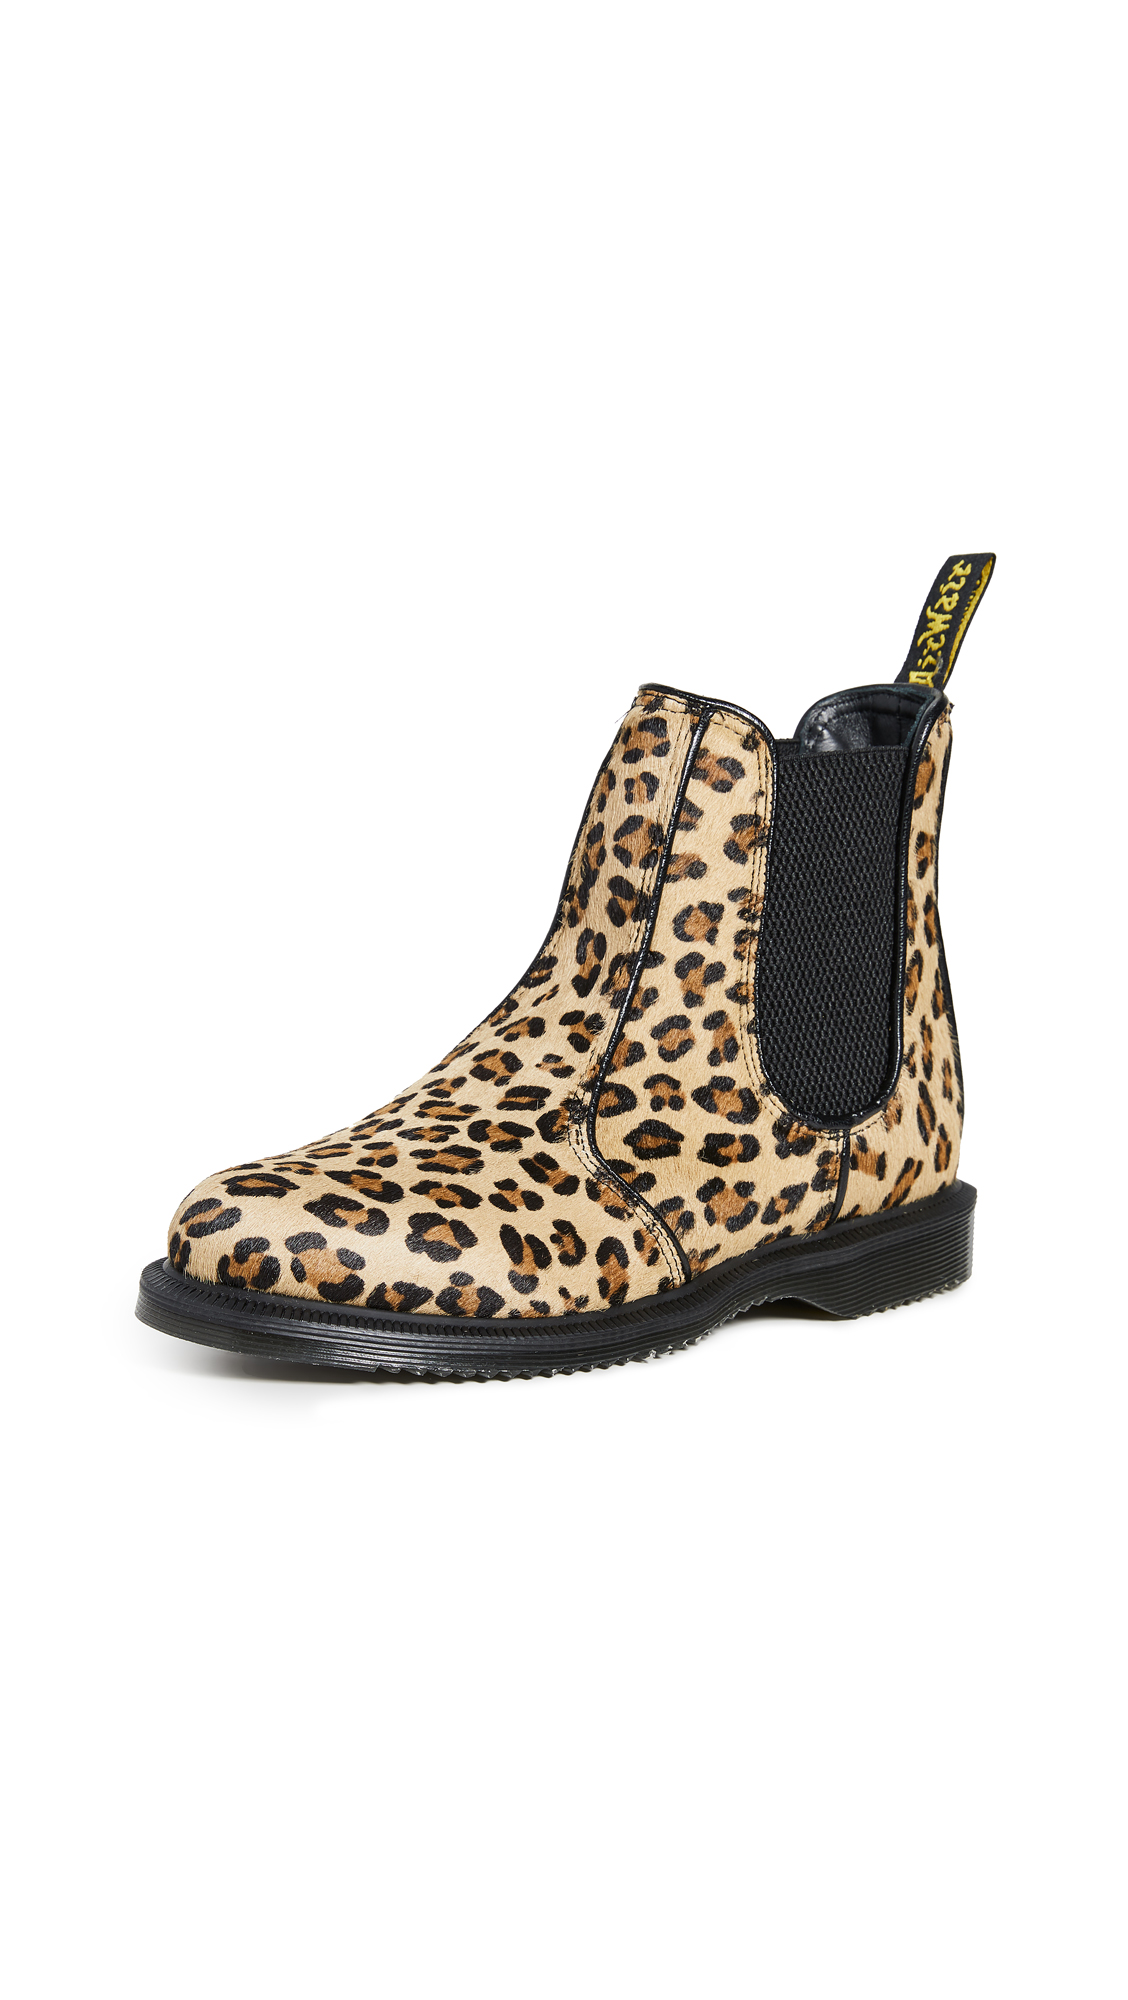 Buy Dr. Martens Flora Hair On Chelsea Boots online, shop Dr. Martens